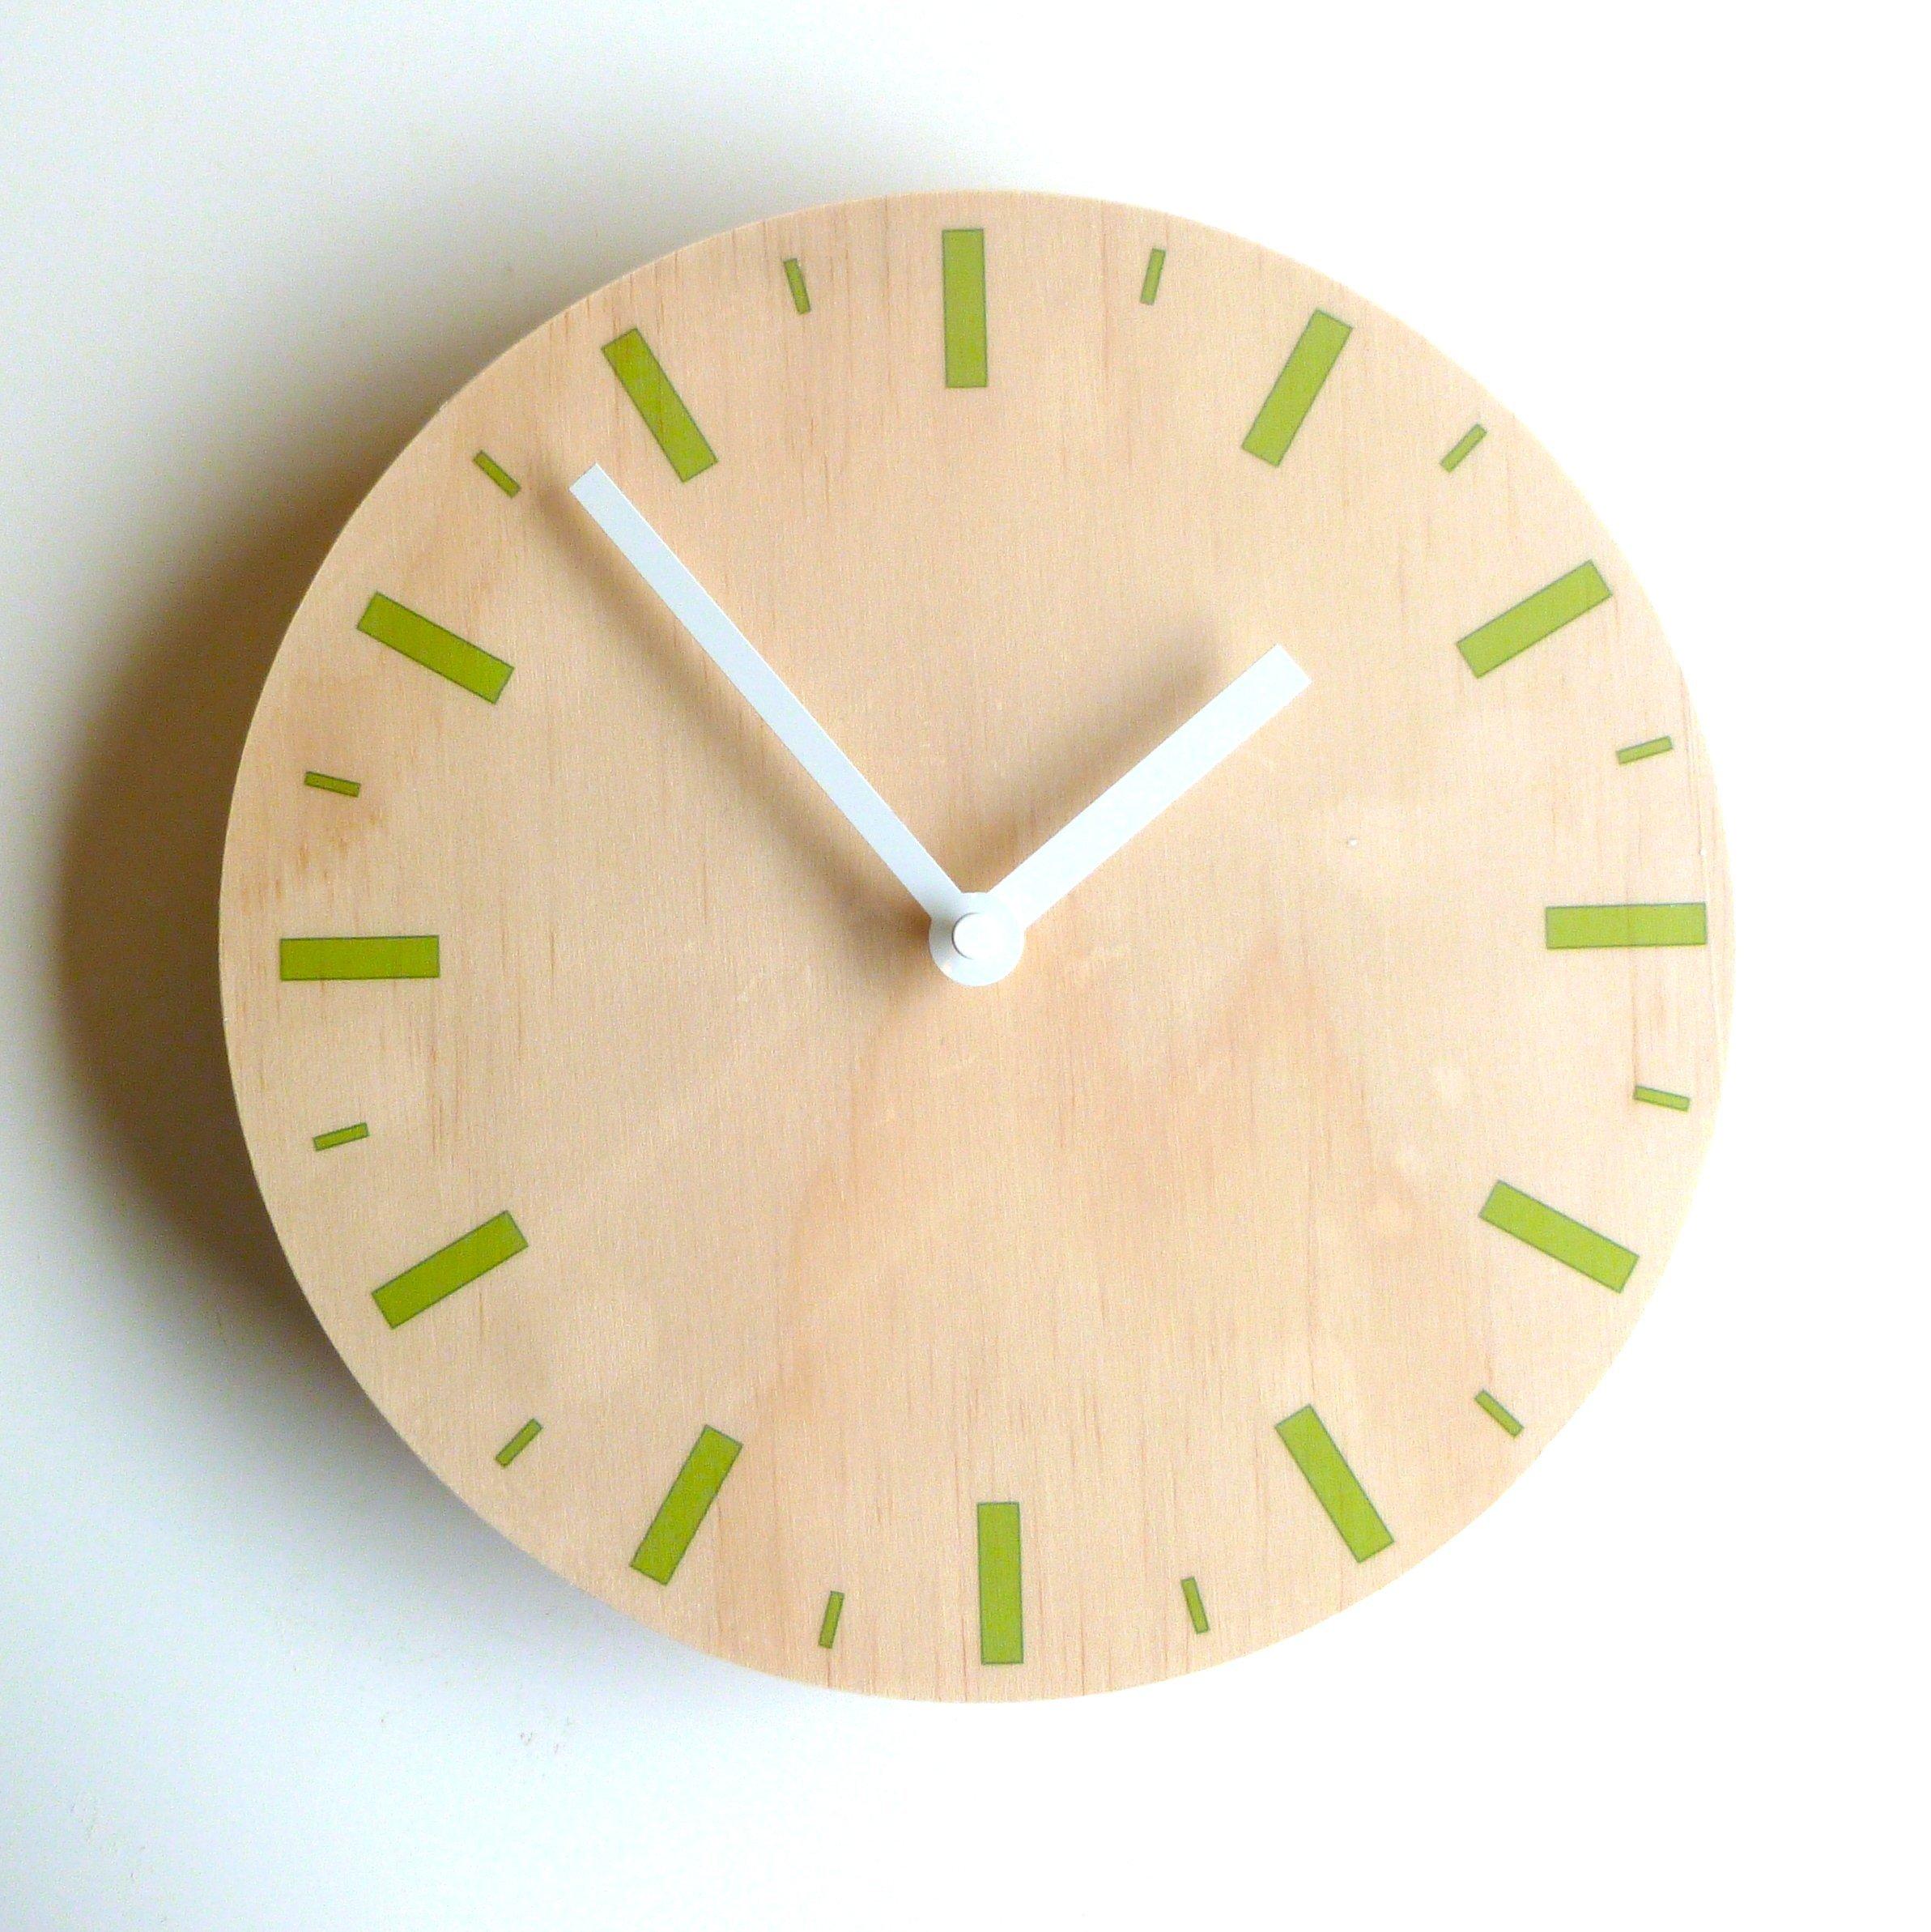 Fullsize Of Standard Wall Clocks